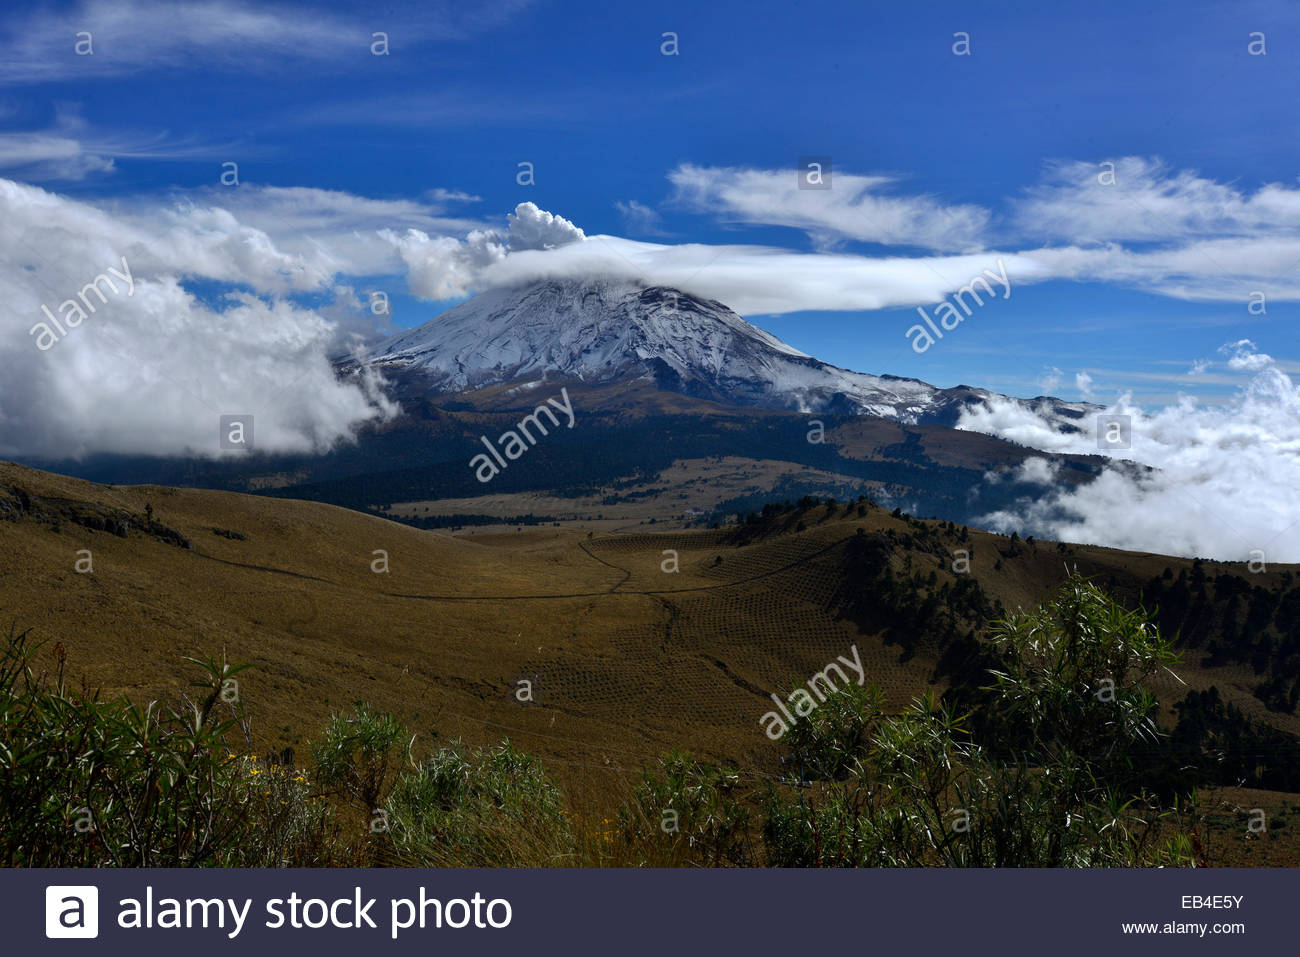 Clouds partially encircle smoking Popocatepetl Volcano. - Stock Image